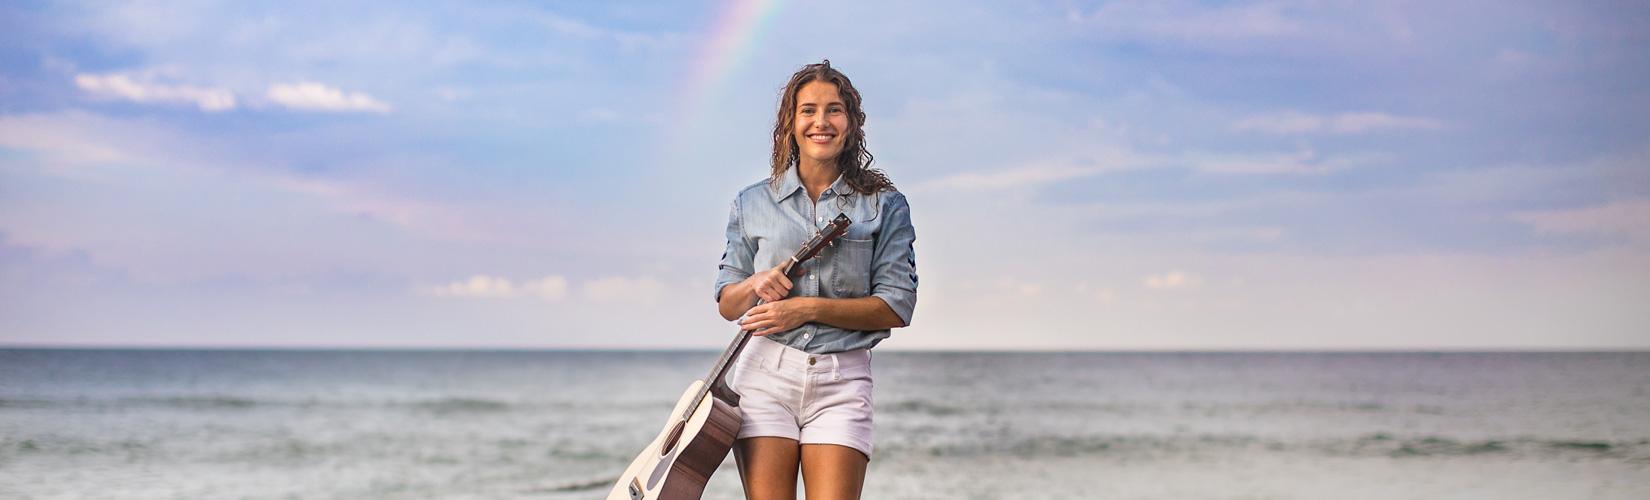 Caroline Jones | Musicians Photography by Sara Kauss Photography